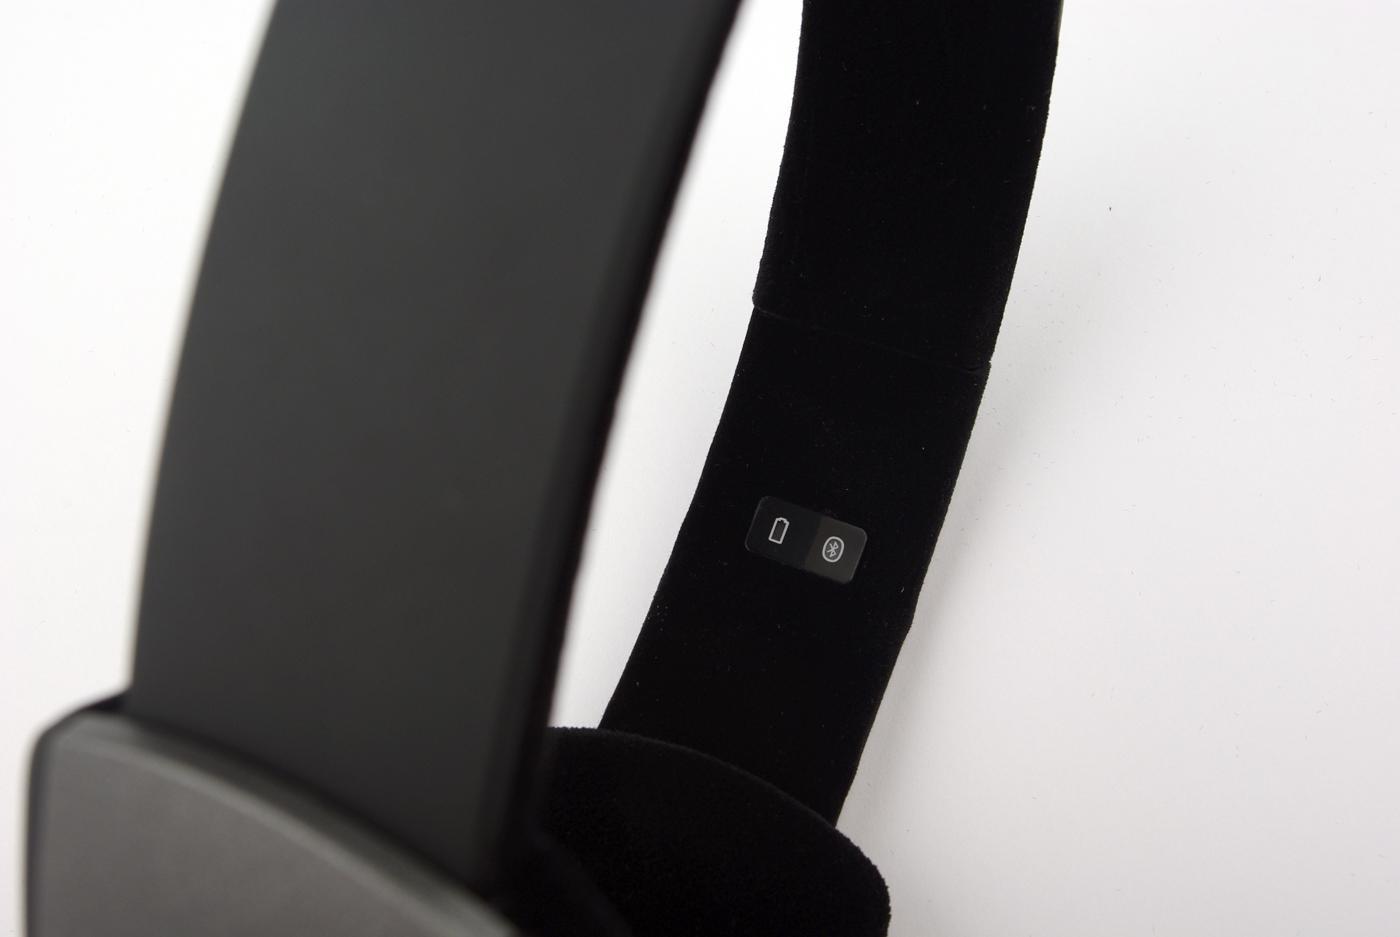 To lysdioder viser status på batteriet og Bluetooth-tilkobling.